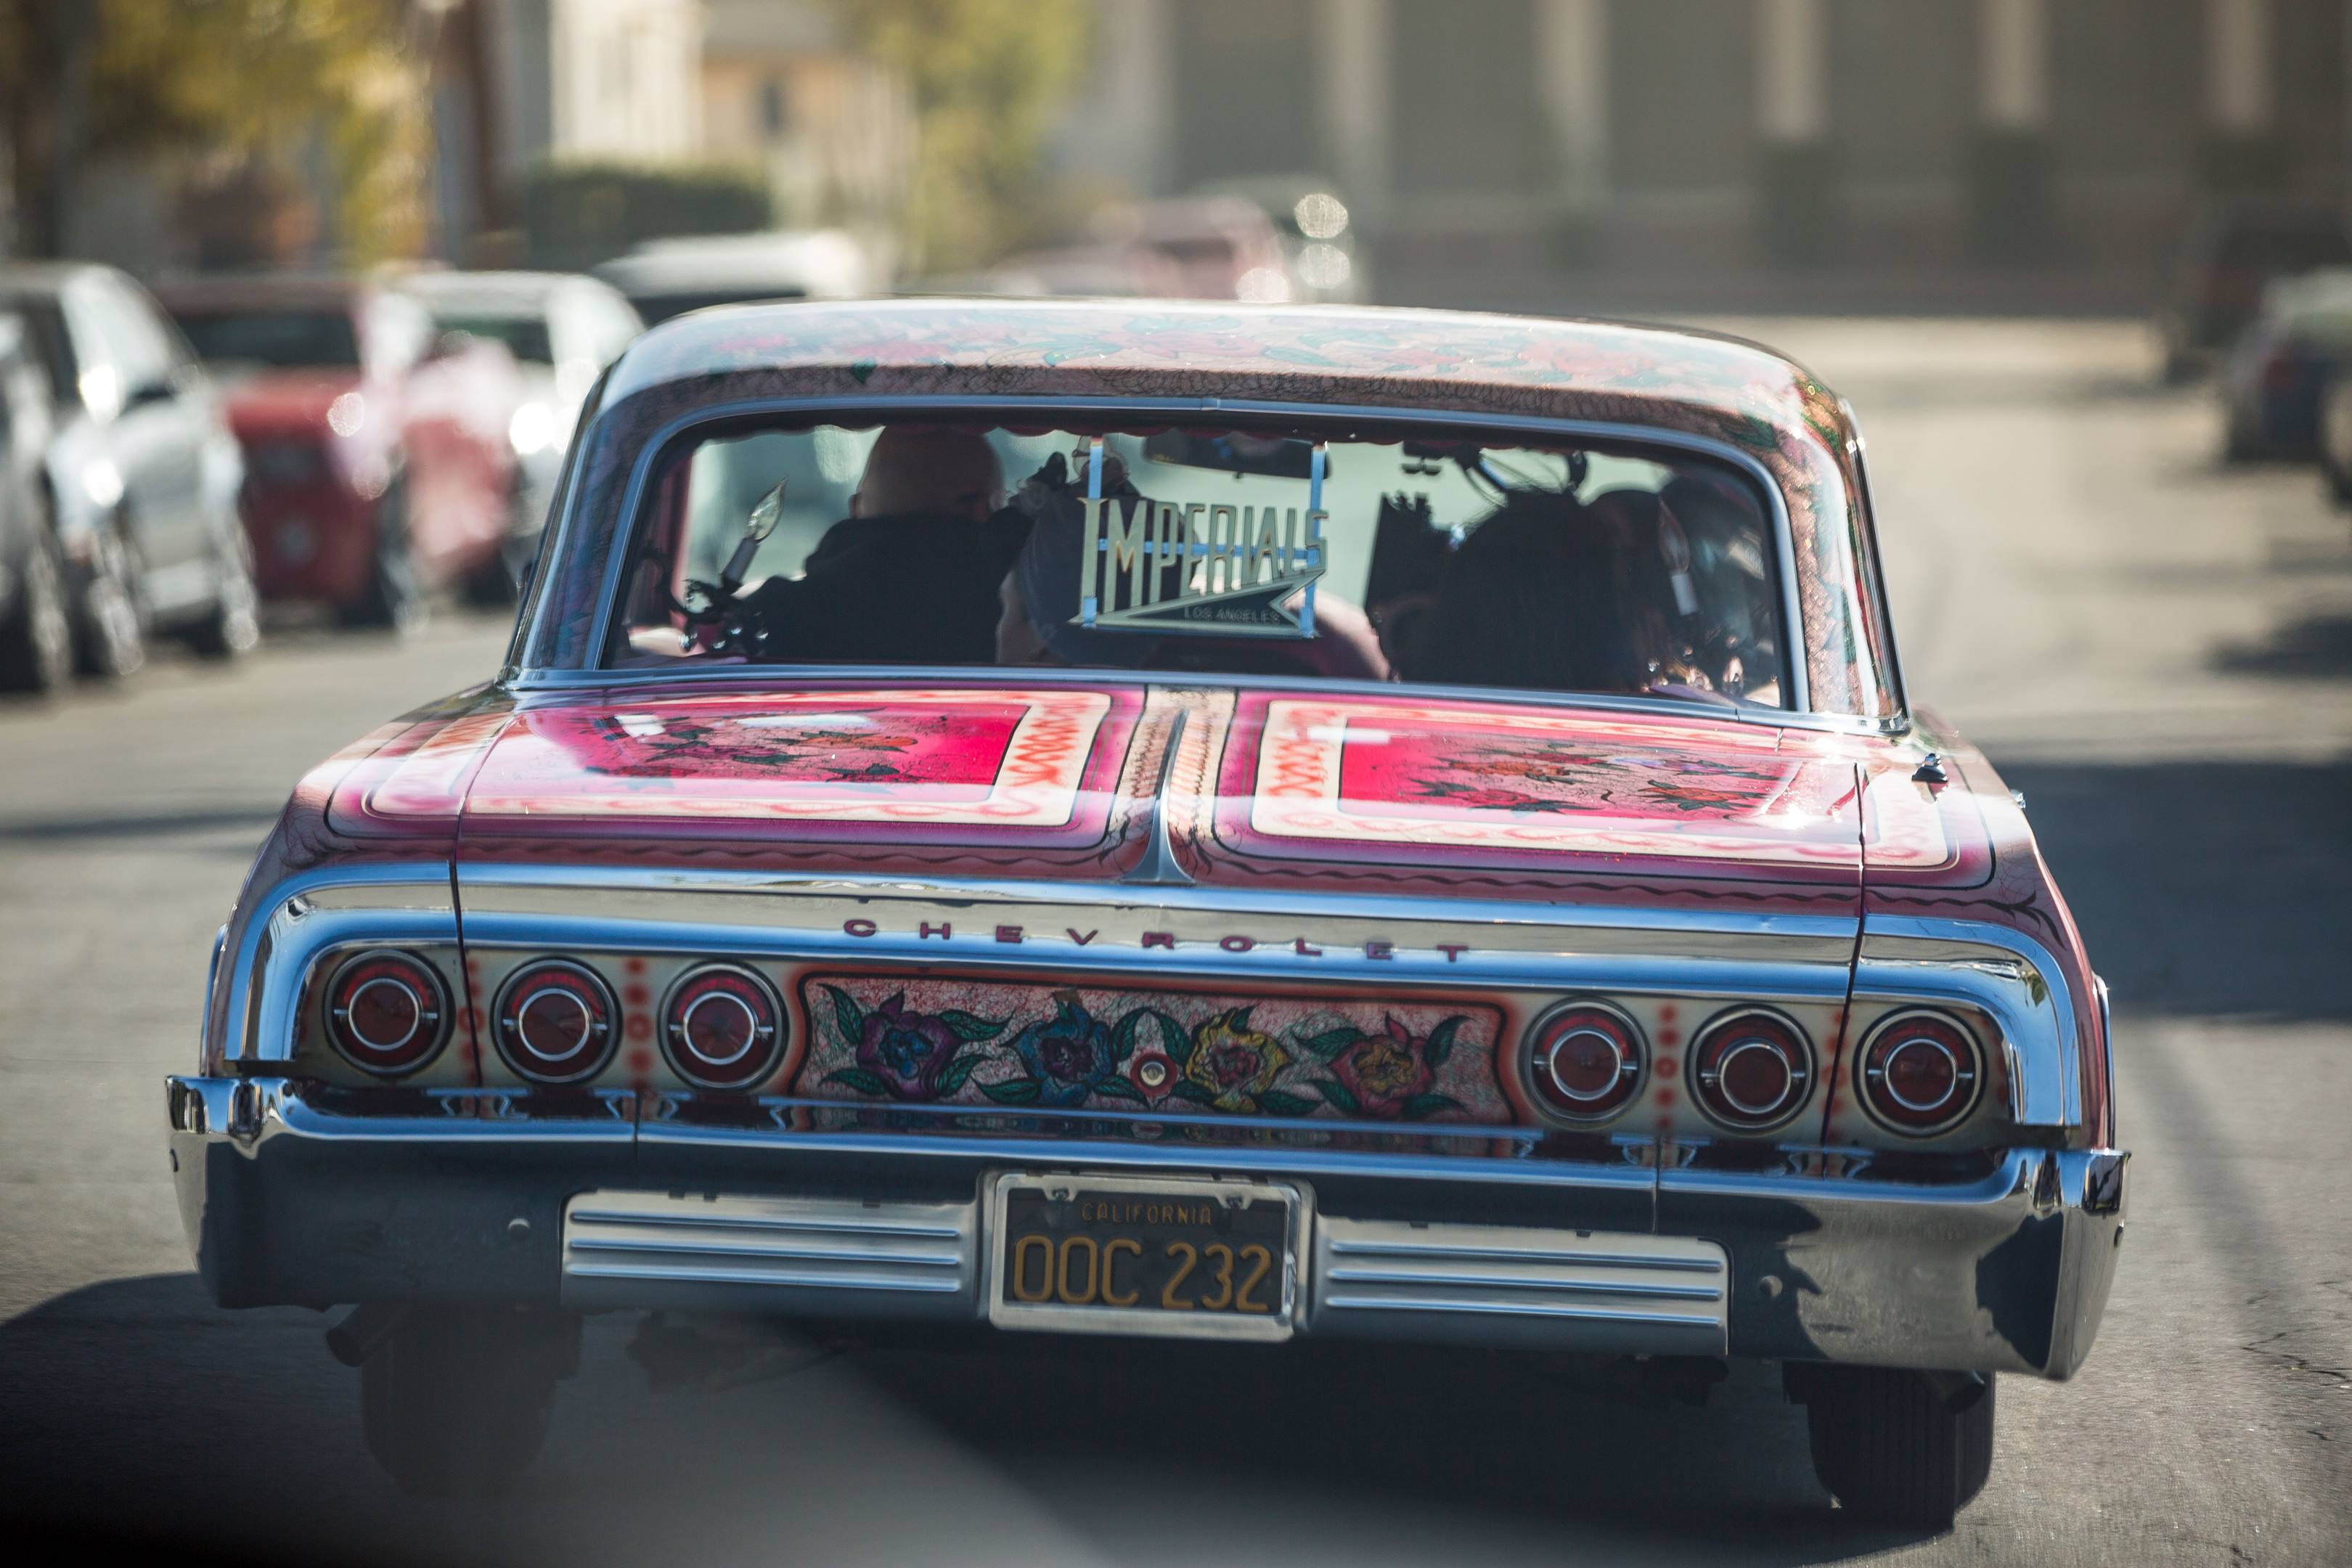 1964 Chevy Impala known as Gypsy Rose rear